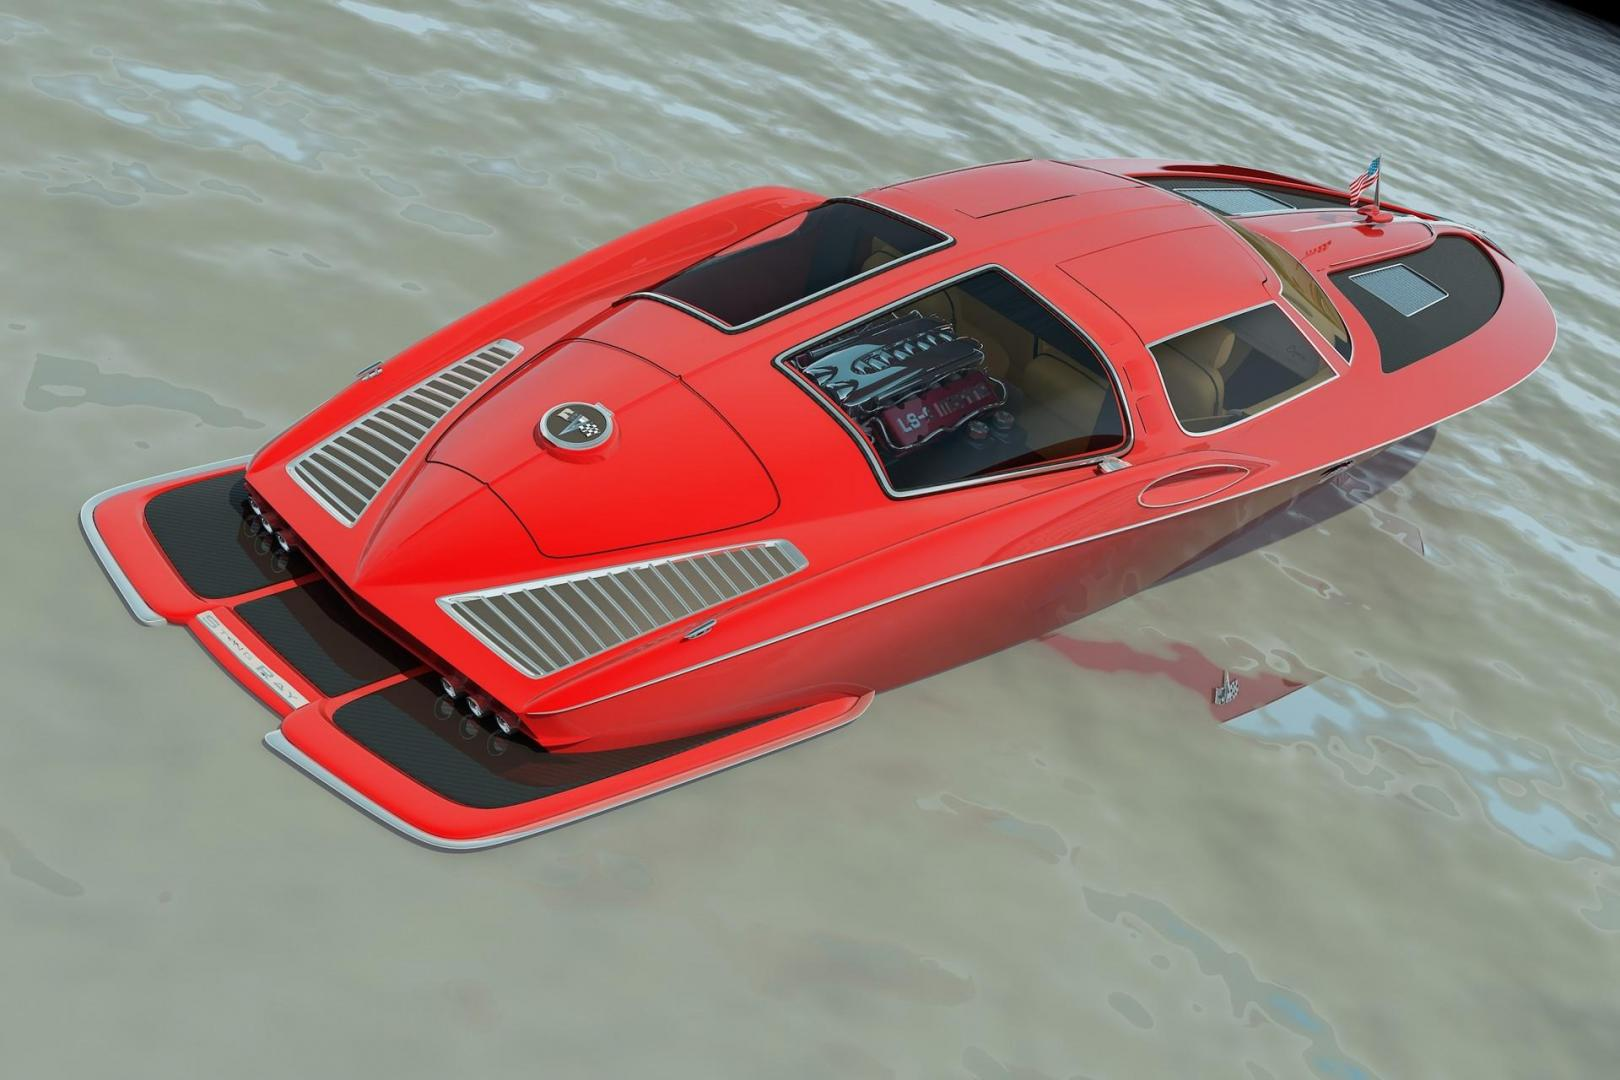 bo-zolland-vetteboat-0099.thumb.jpg.9aec983ef5b0cf61990e9fc62b9c985f.jpg